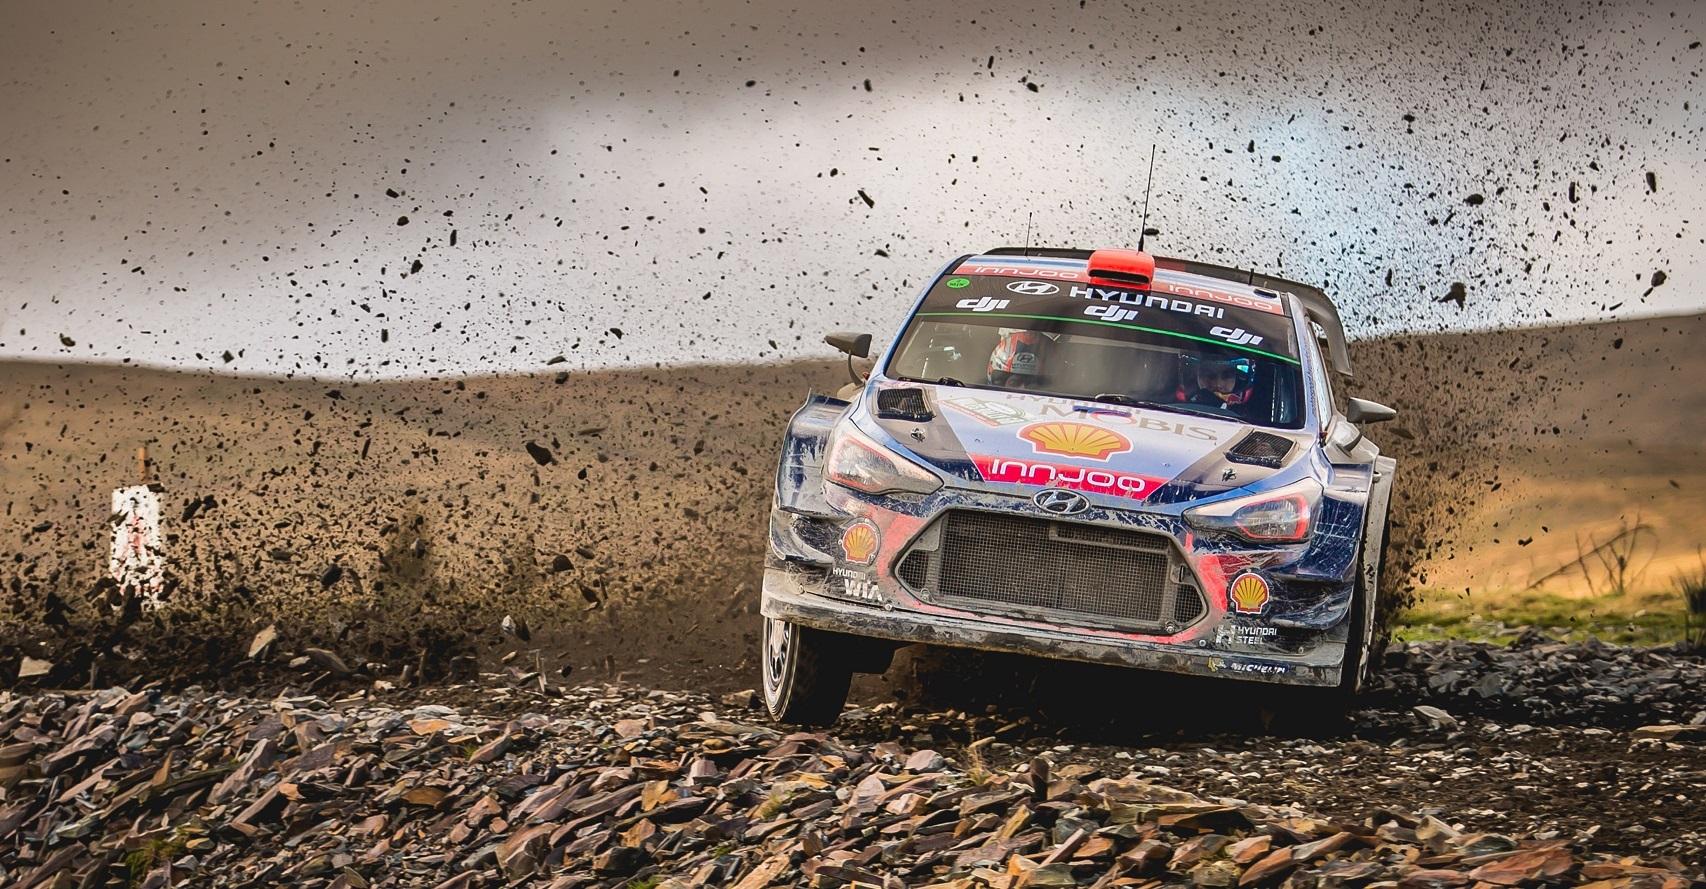 AUTOMOBILE: WRC Wales Rally GB - WRC -26/10/2017